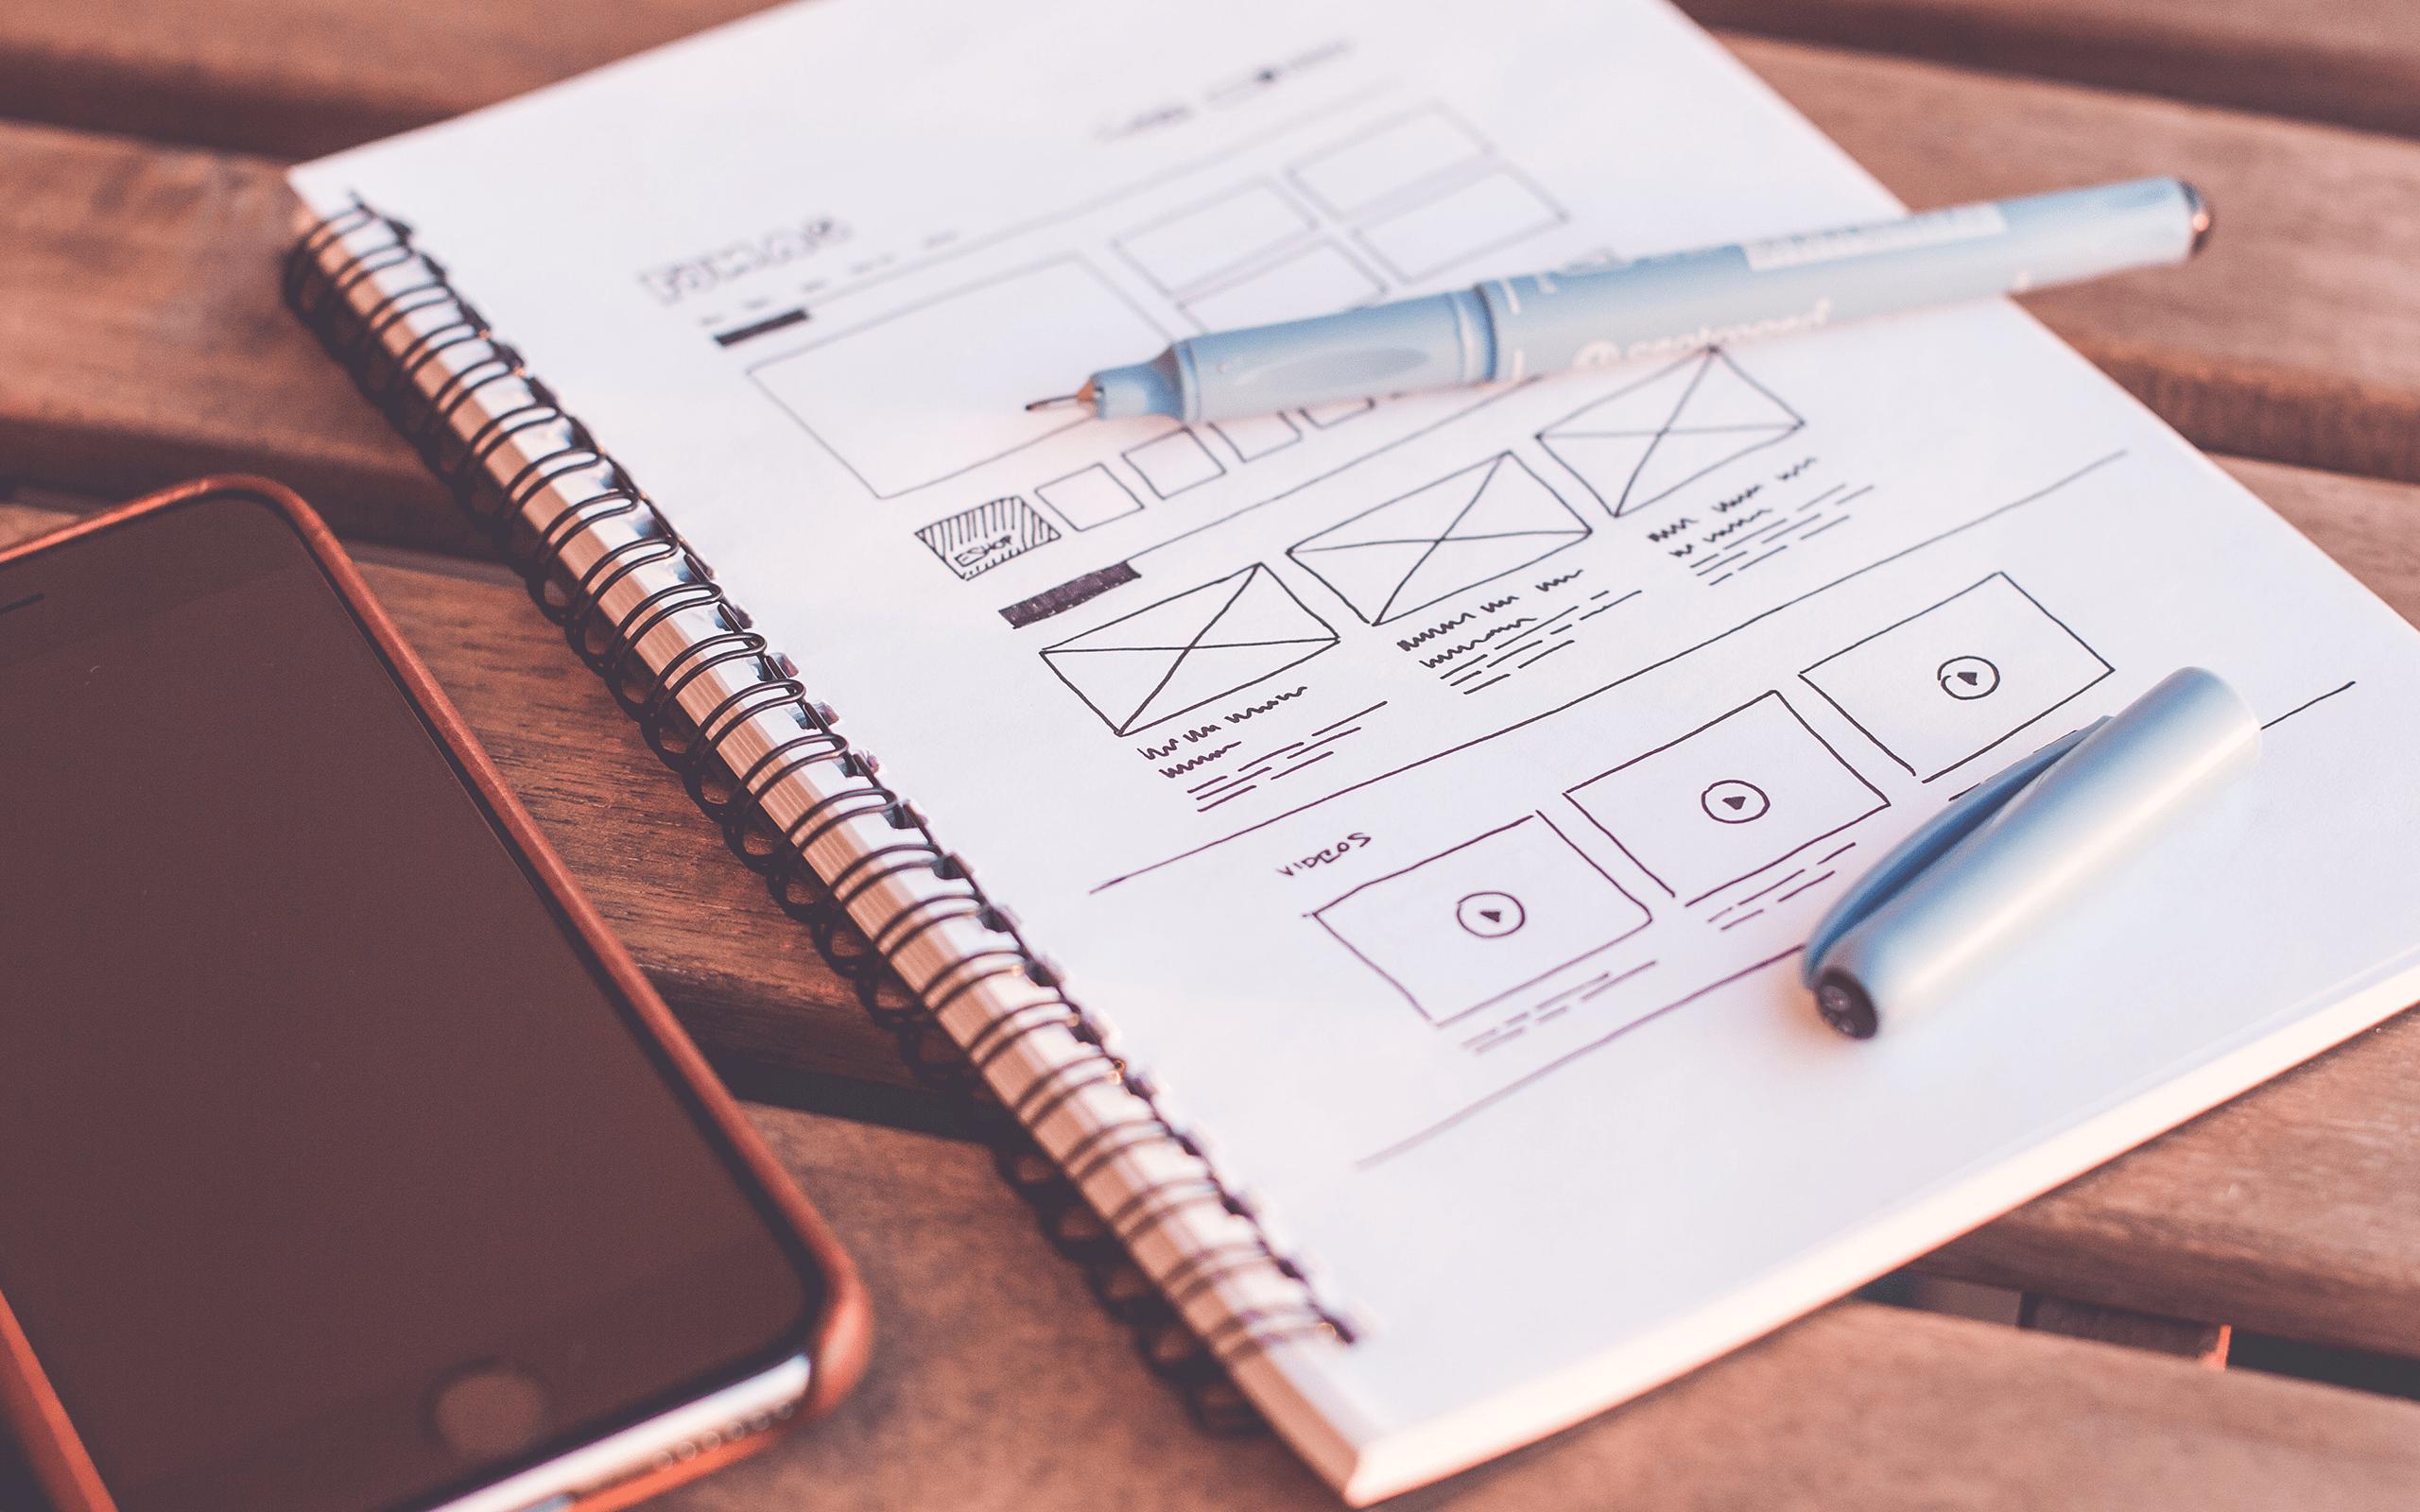 Our Mission: Democratizing Design